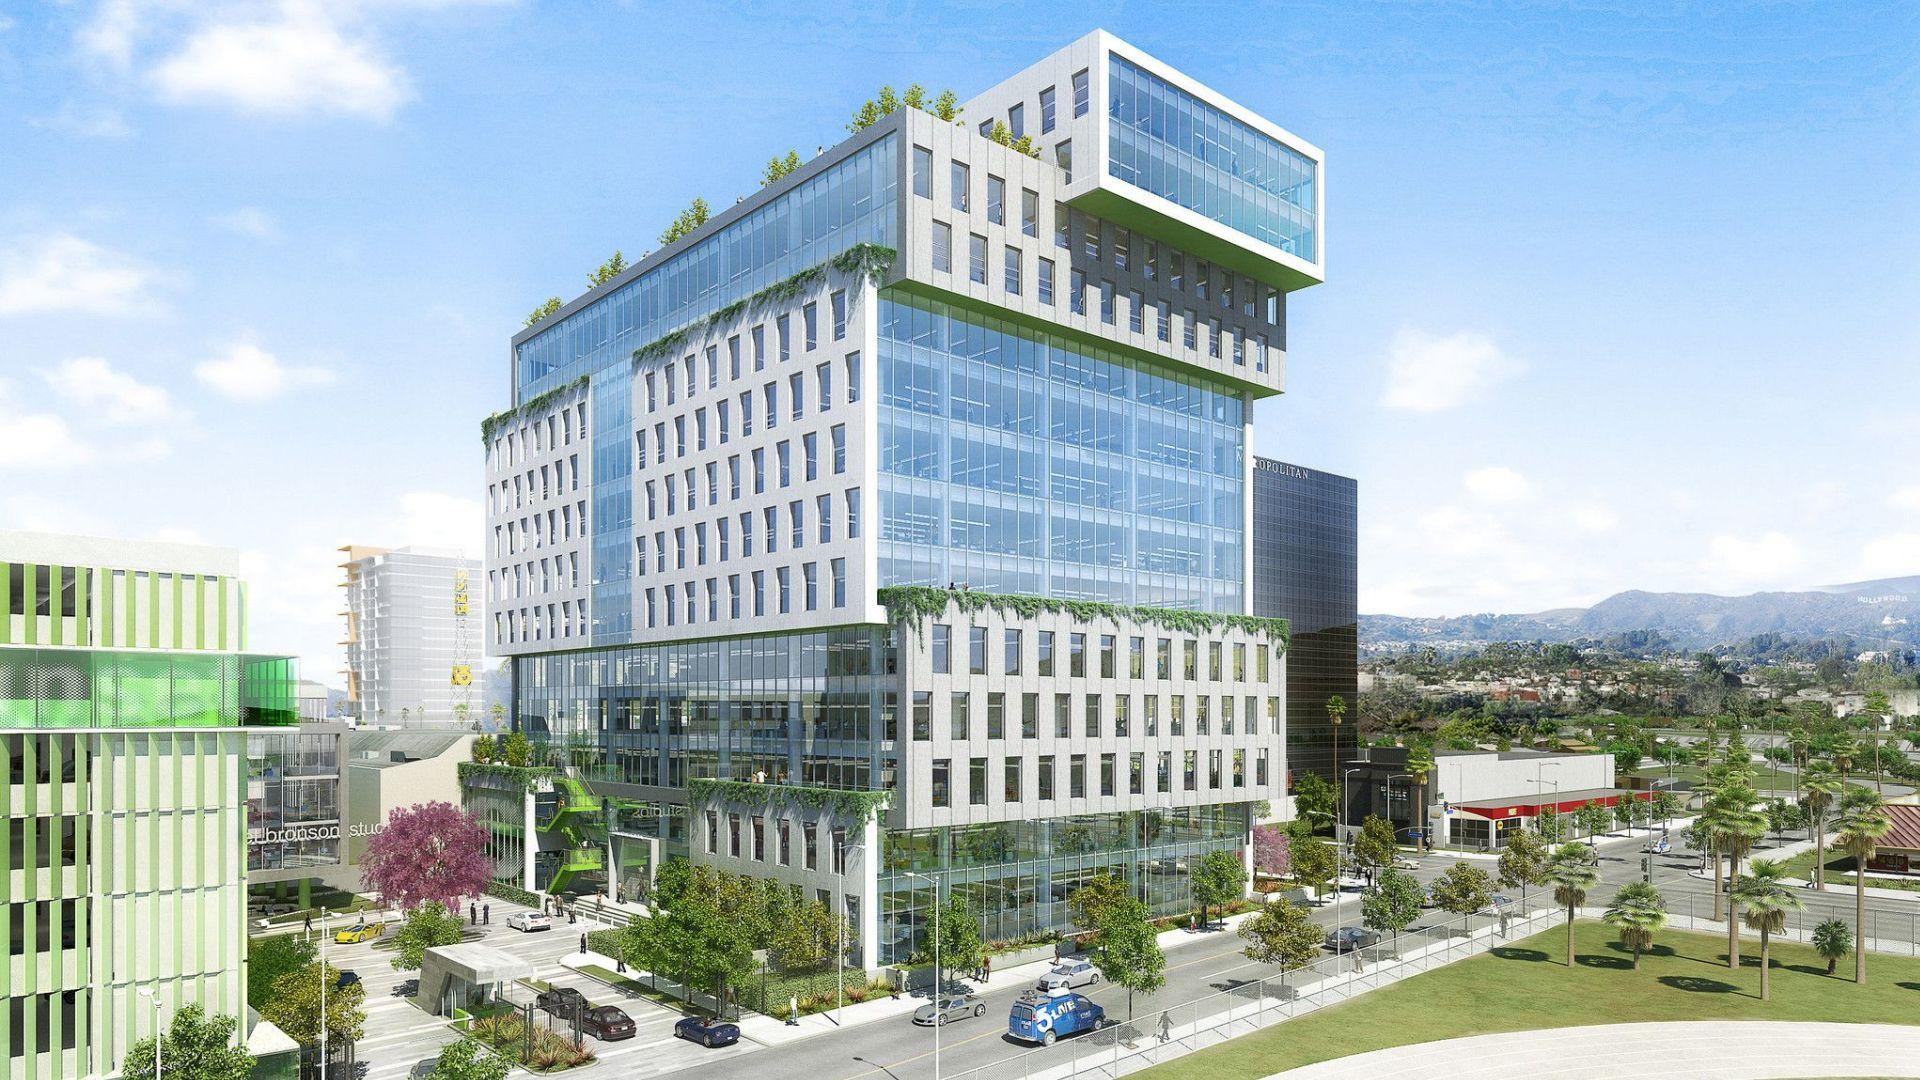 Integrated Solar Panels For Netflix Building